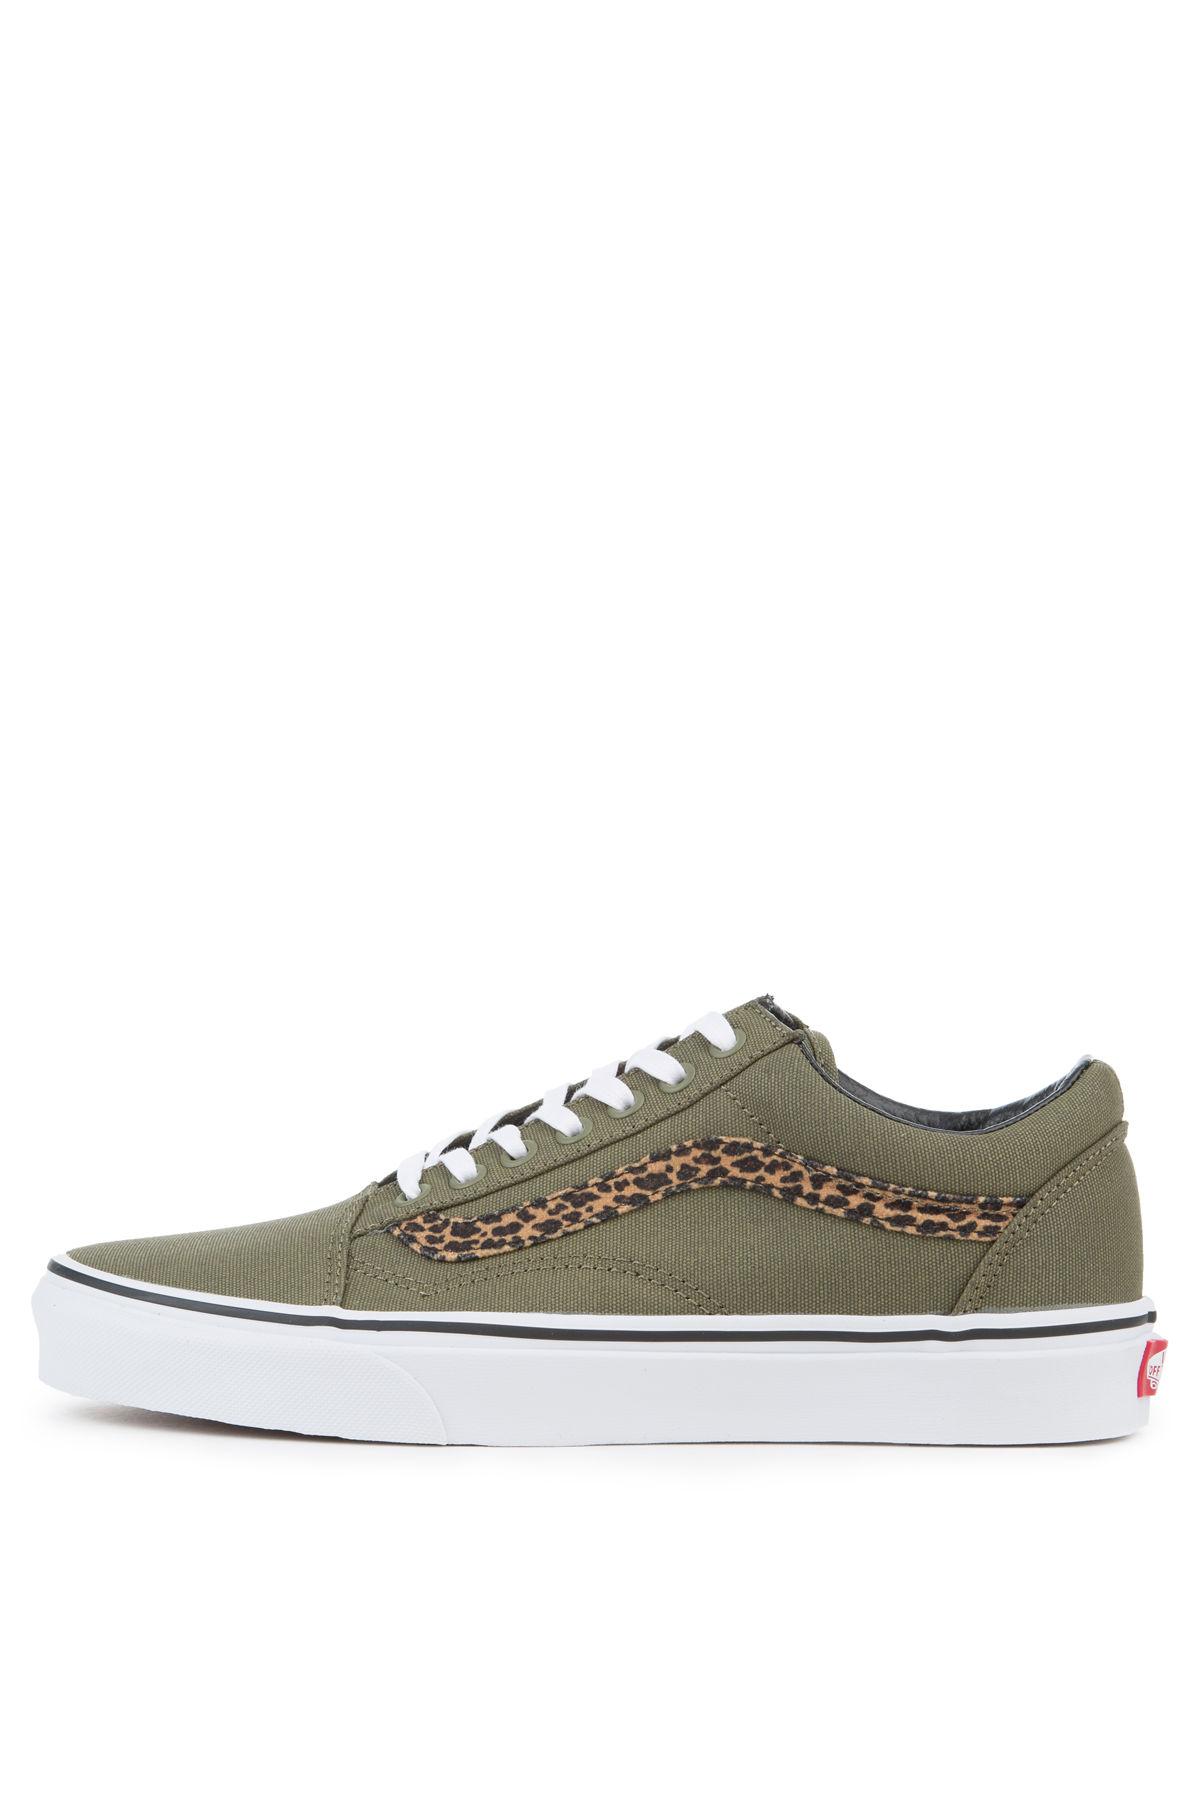 buy \u003e vans mini leopard old skool, Up